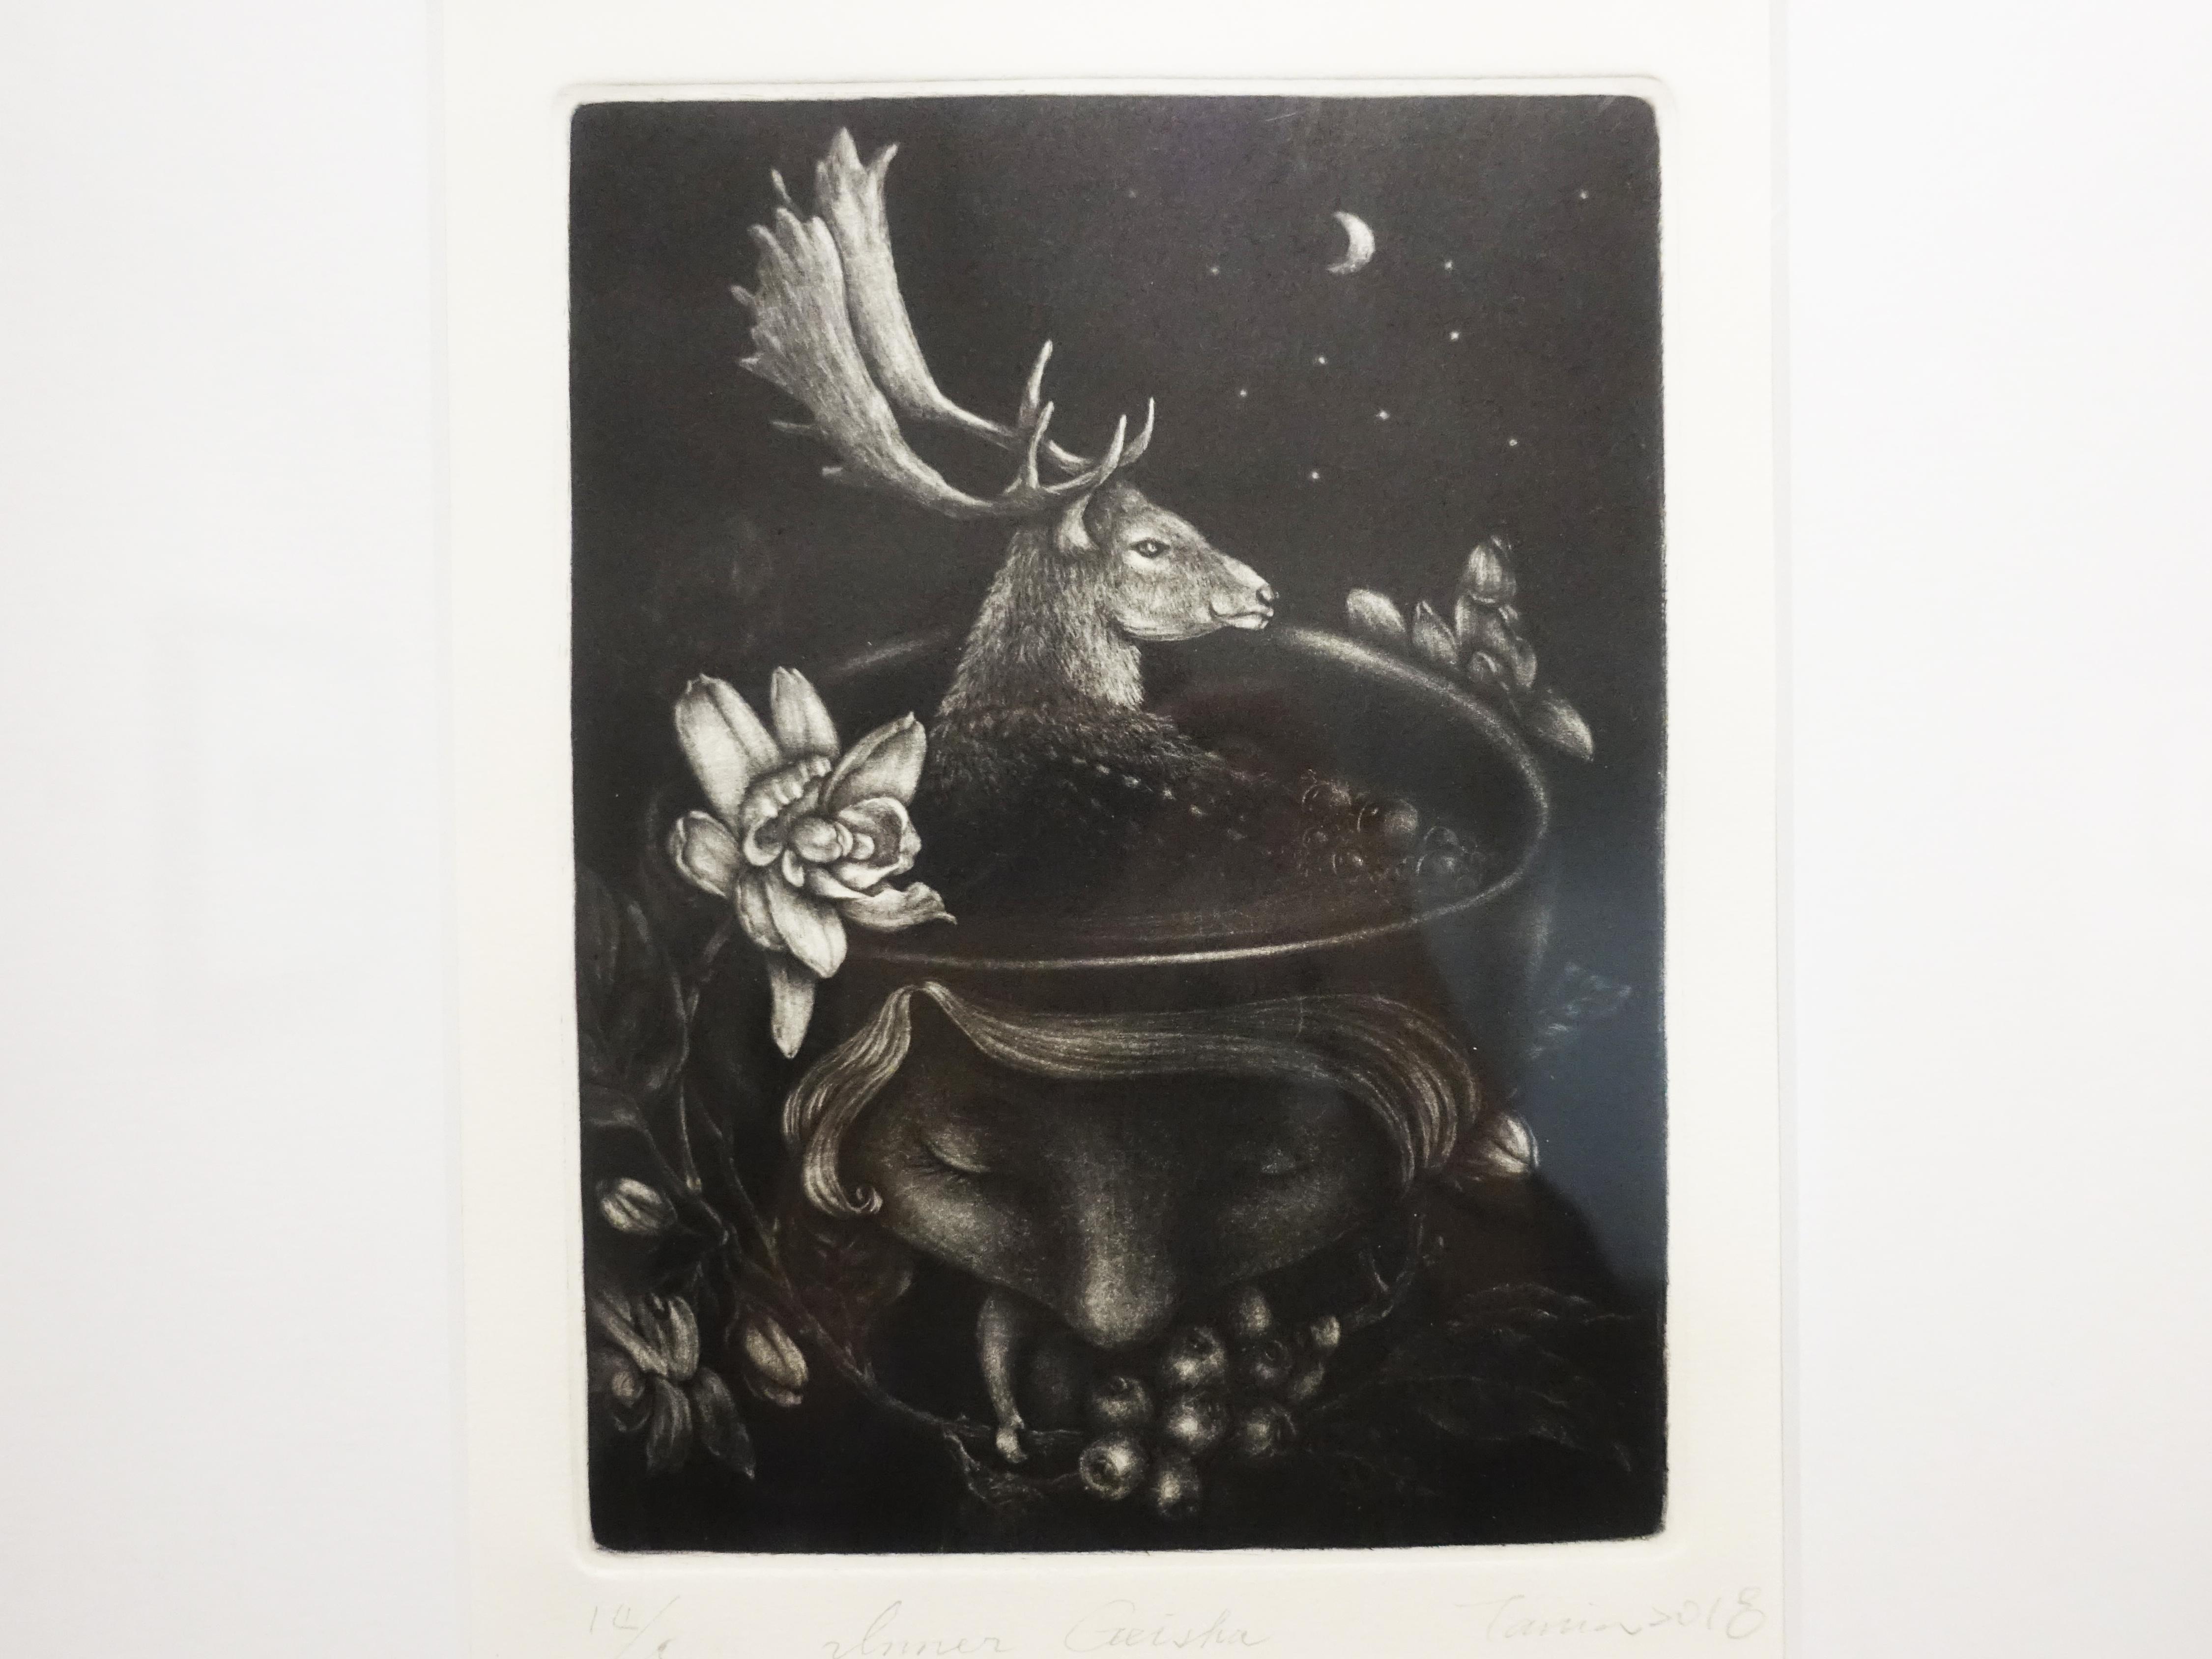 周姲醇,《Inner Geisha》,15 x 20 cm,美柔丁14/25,2018。